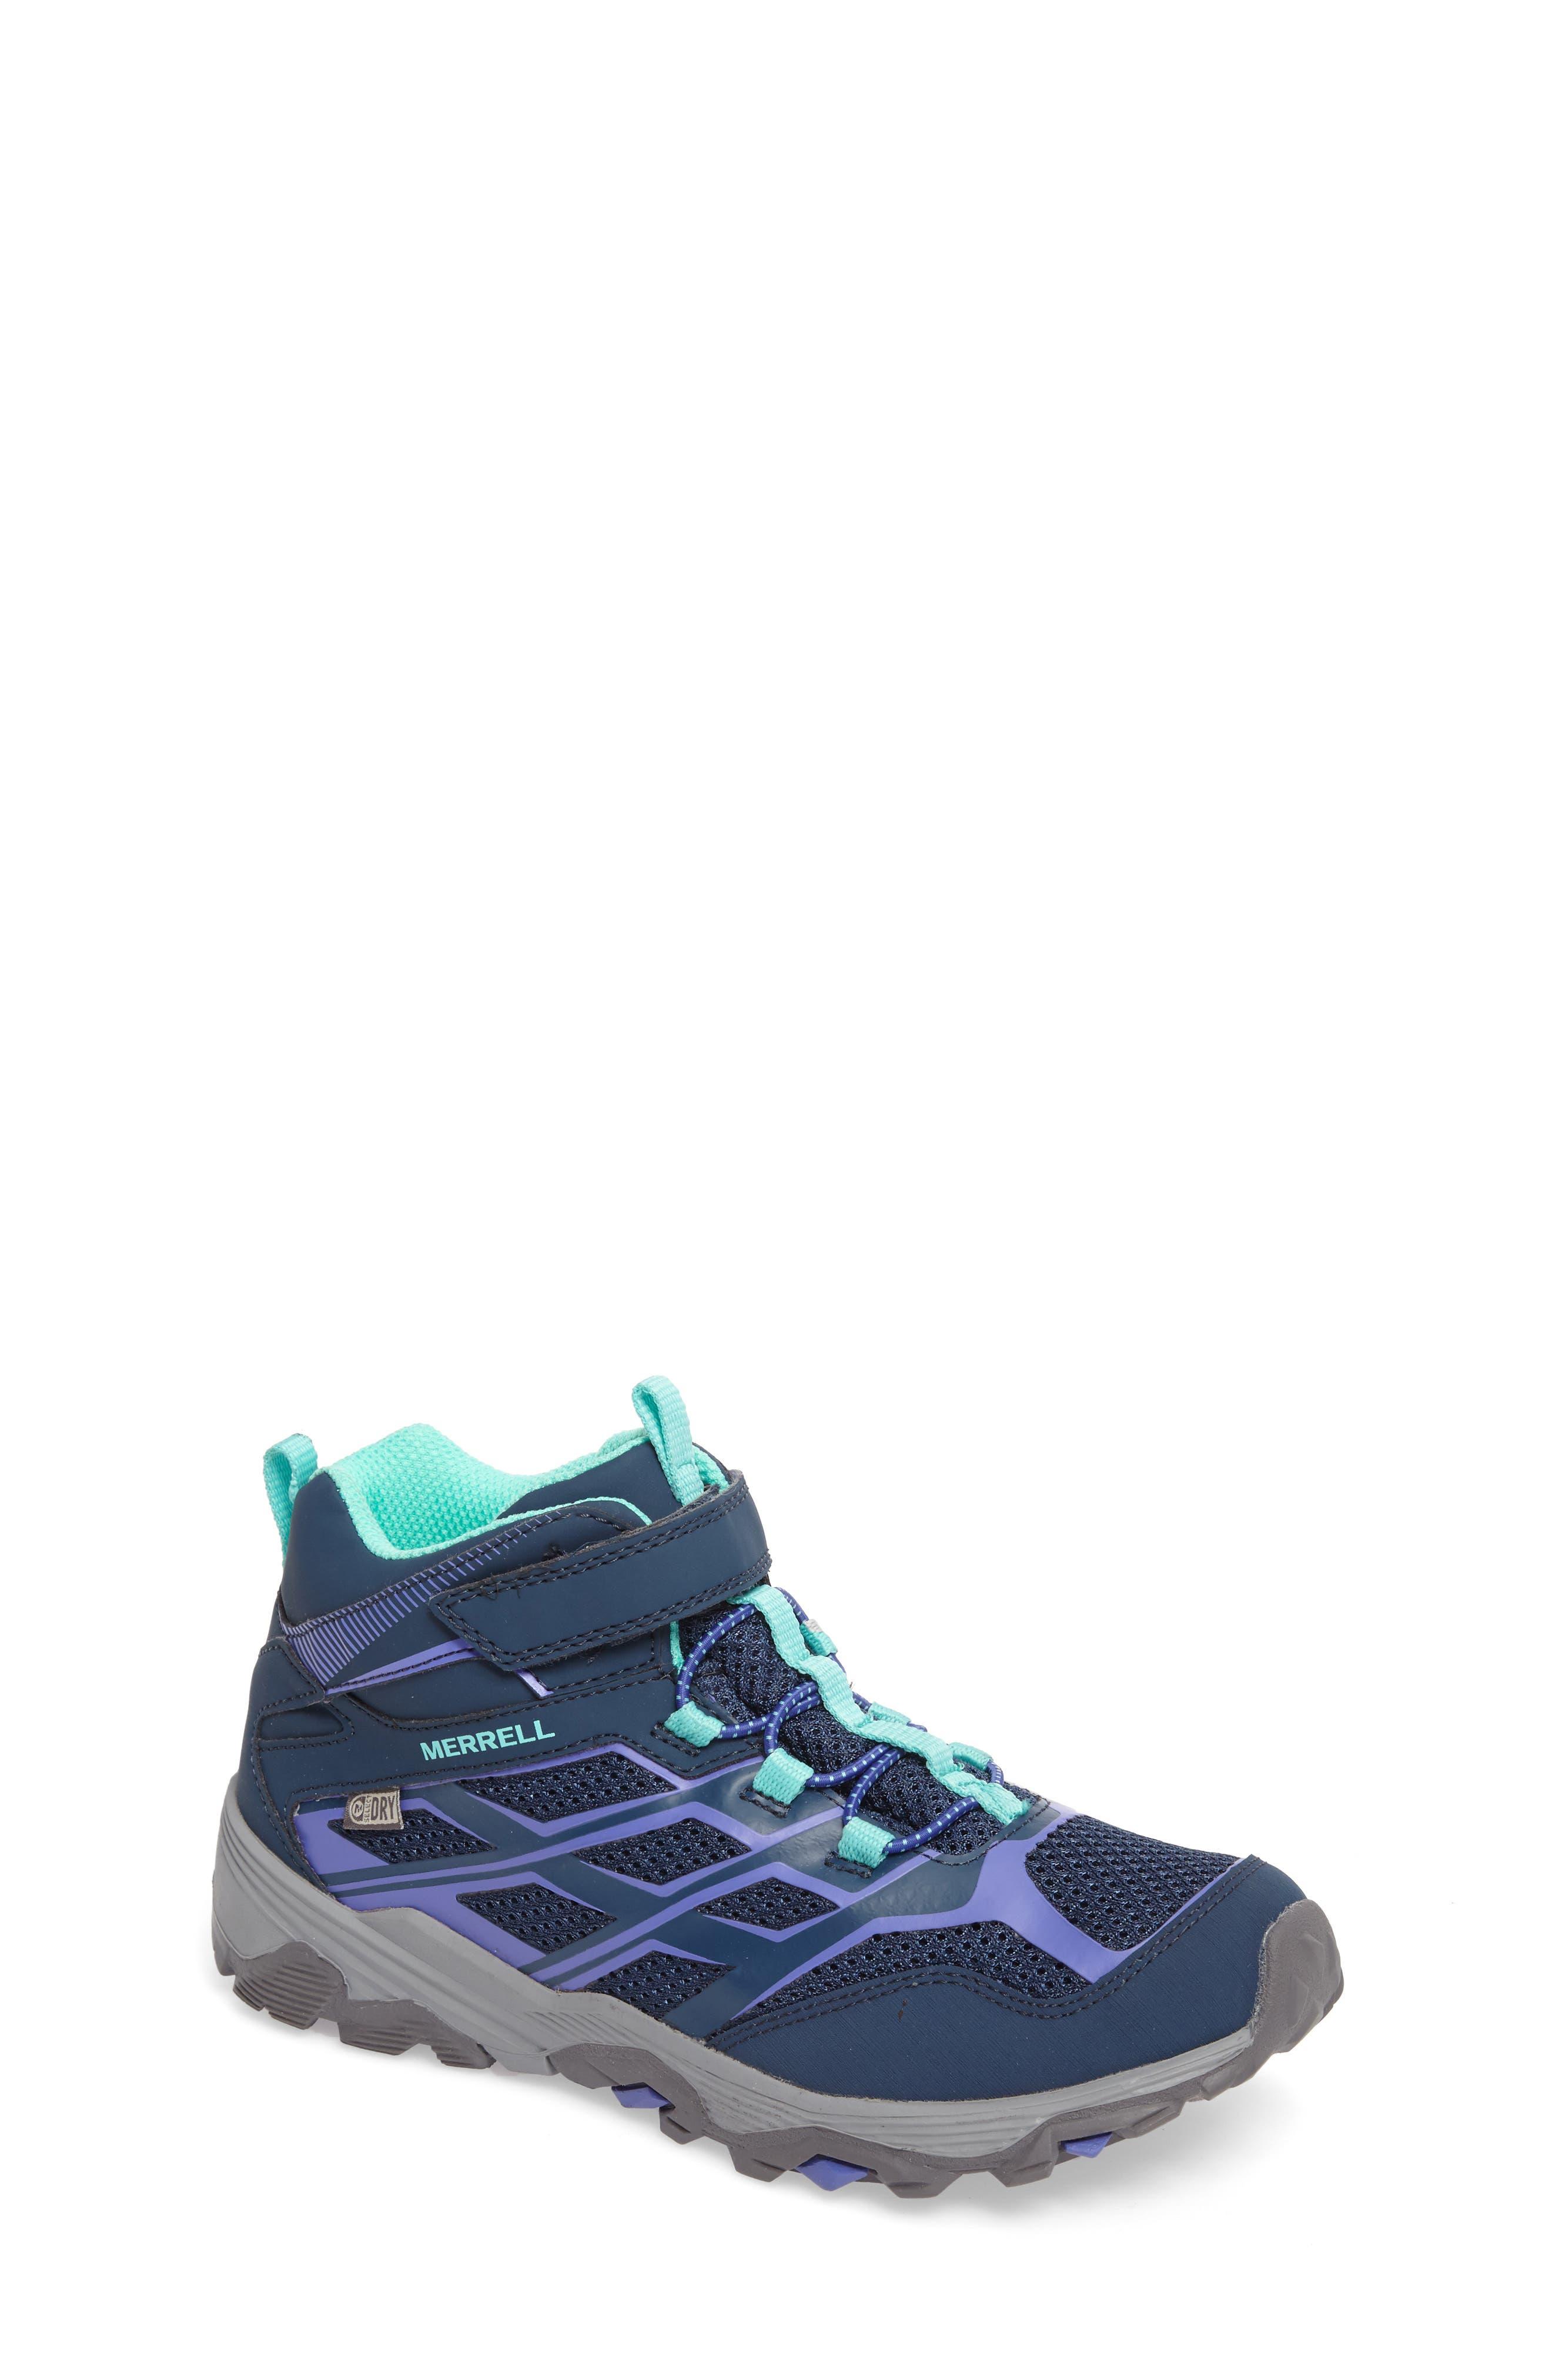 Main Image - Merrell Moab FST Polar Mid Insulated Waterproof Sneaker Boot (Baby, Walker, Toddler, Little Kid & Big Kid)